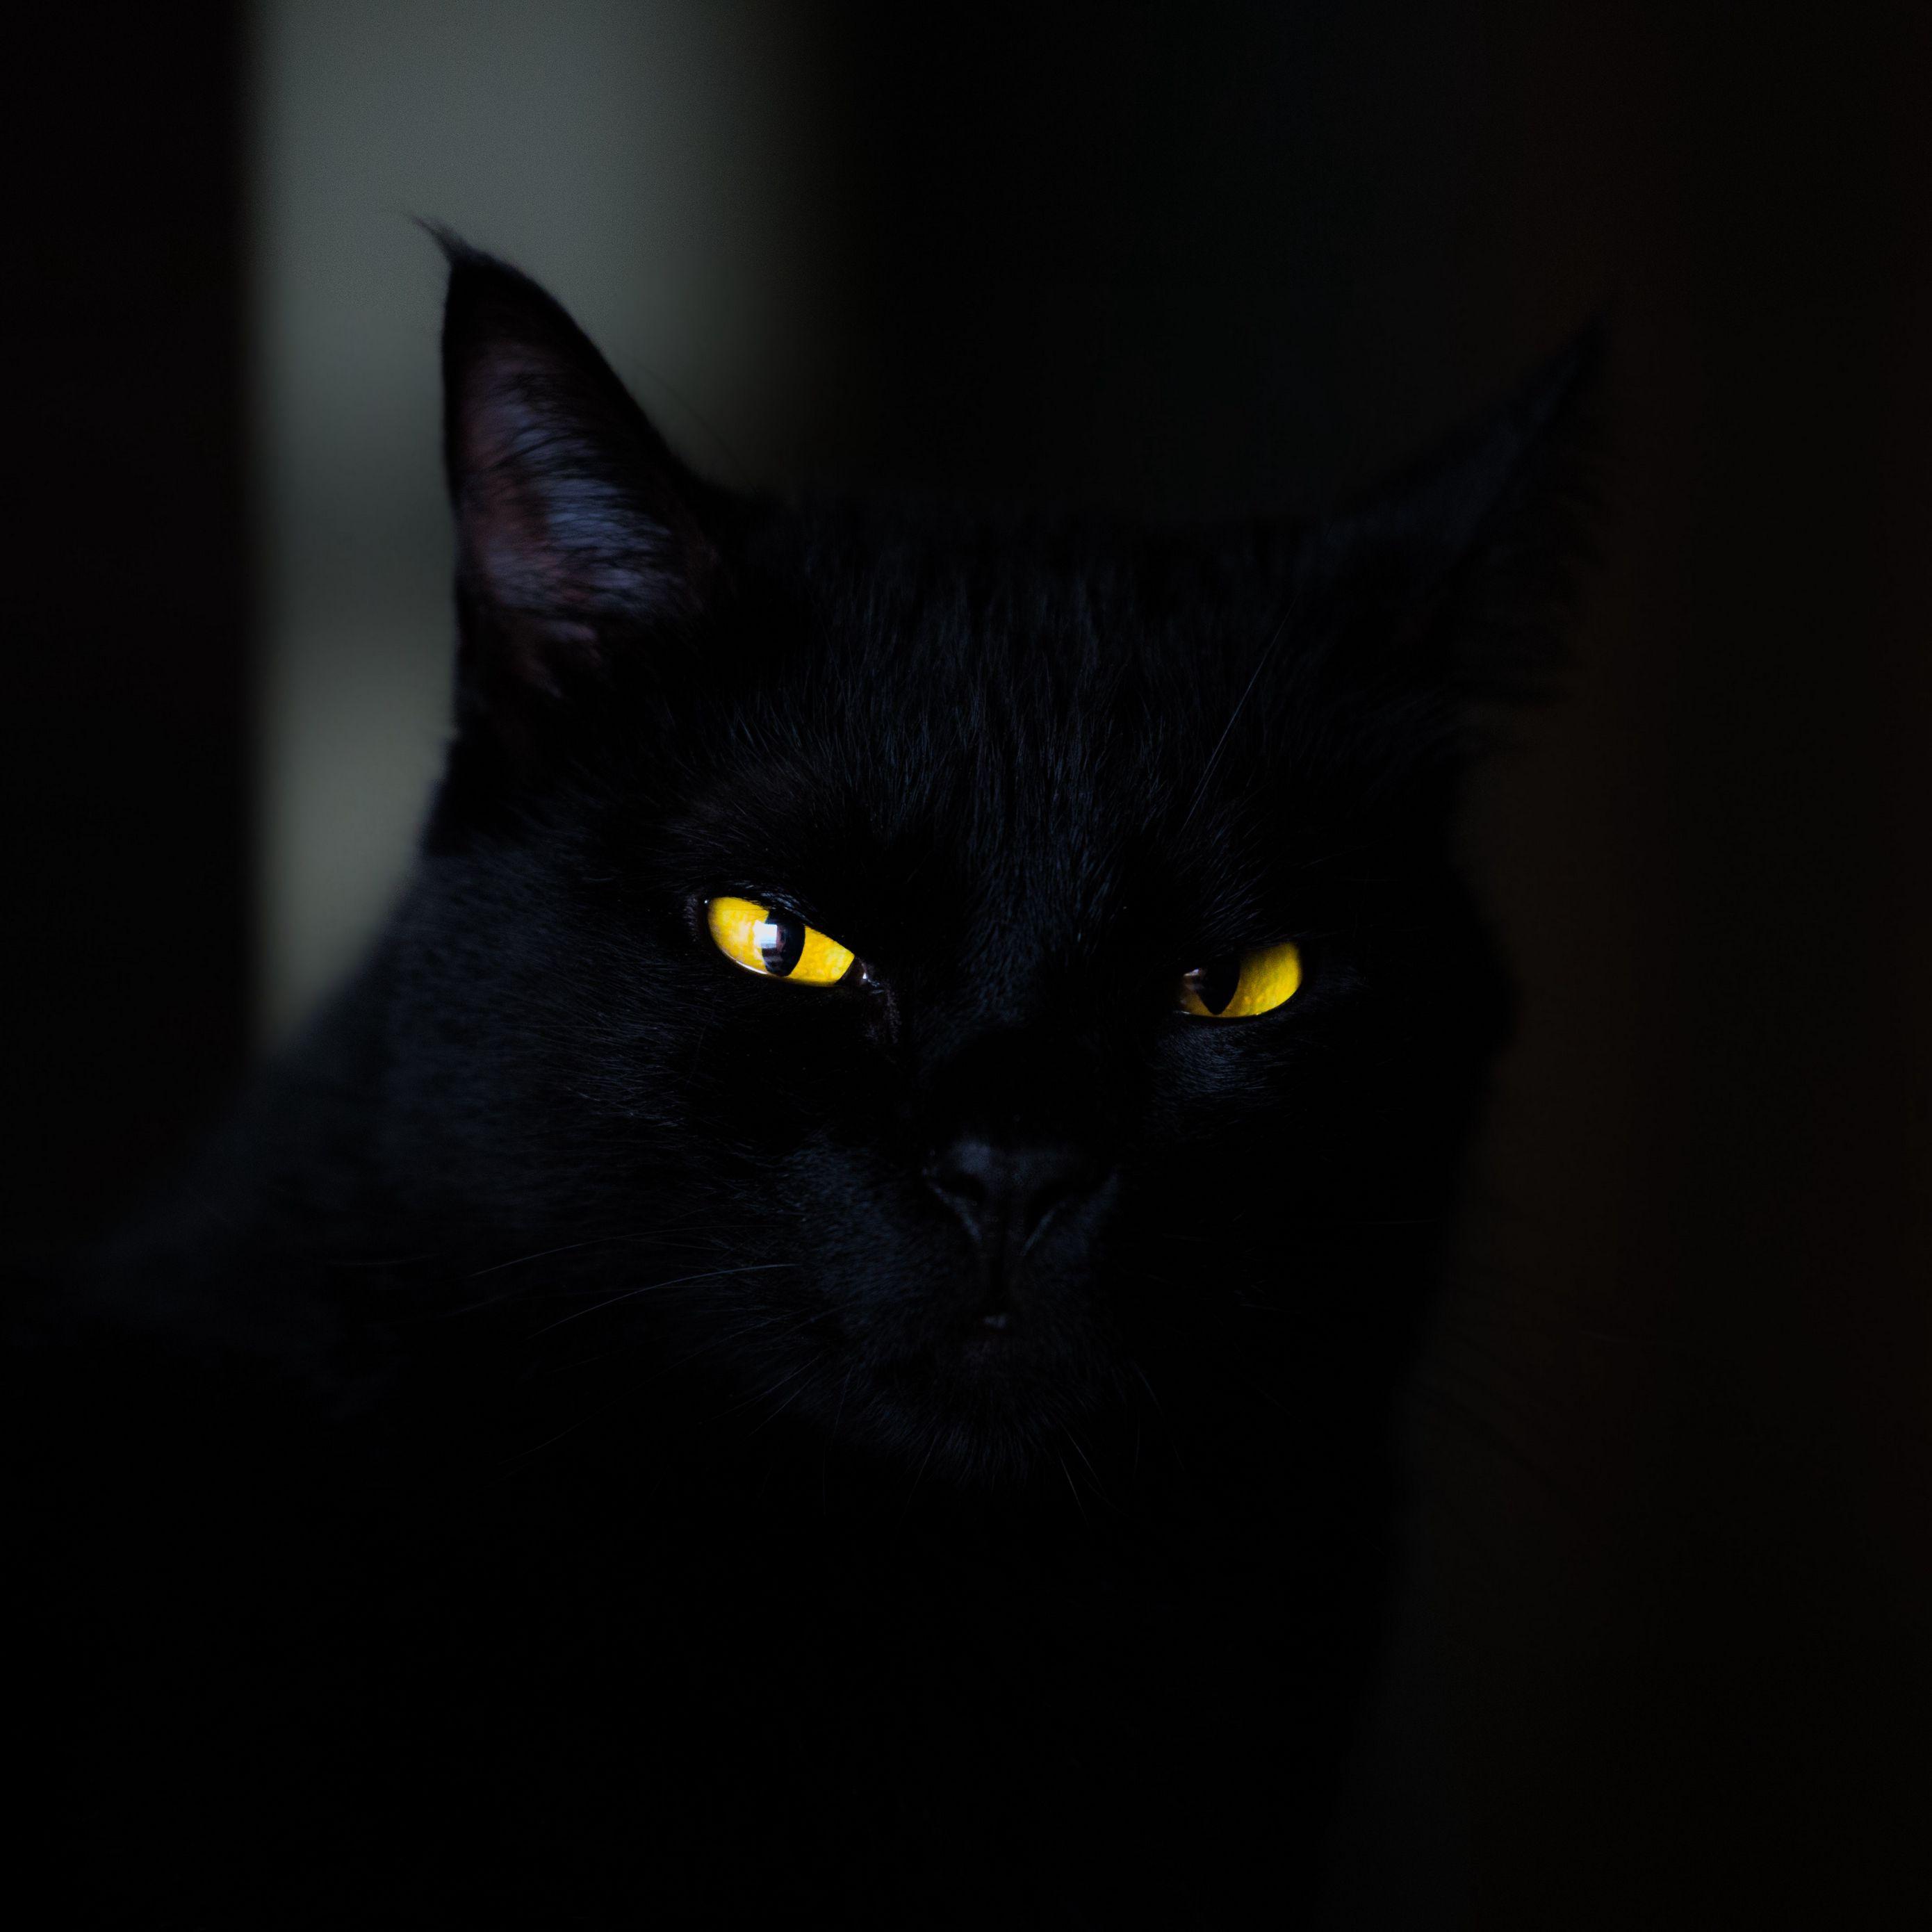 2780x2780 Wallpaper cat, eyes, black